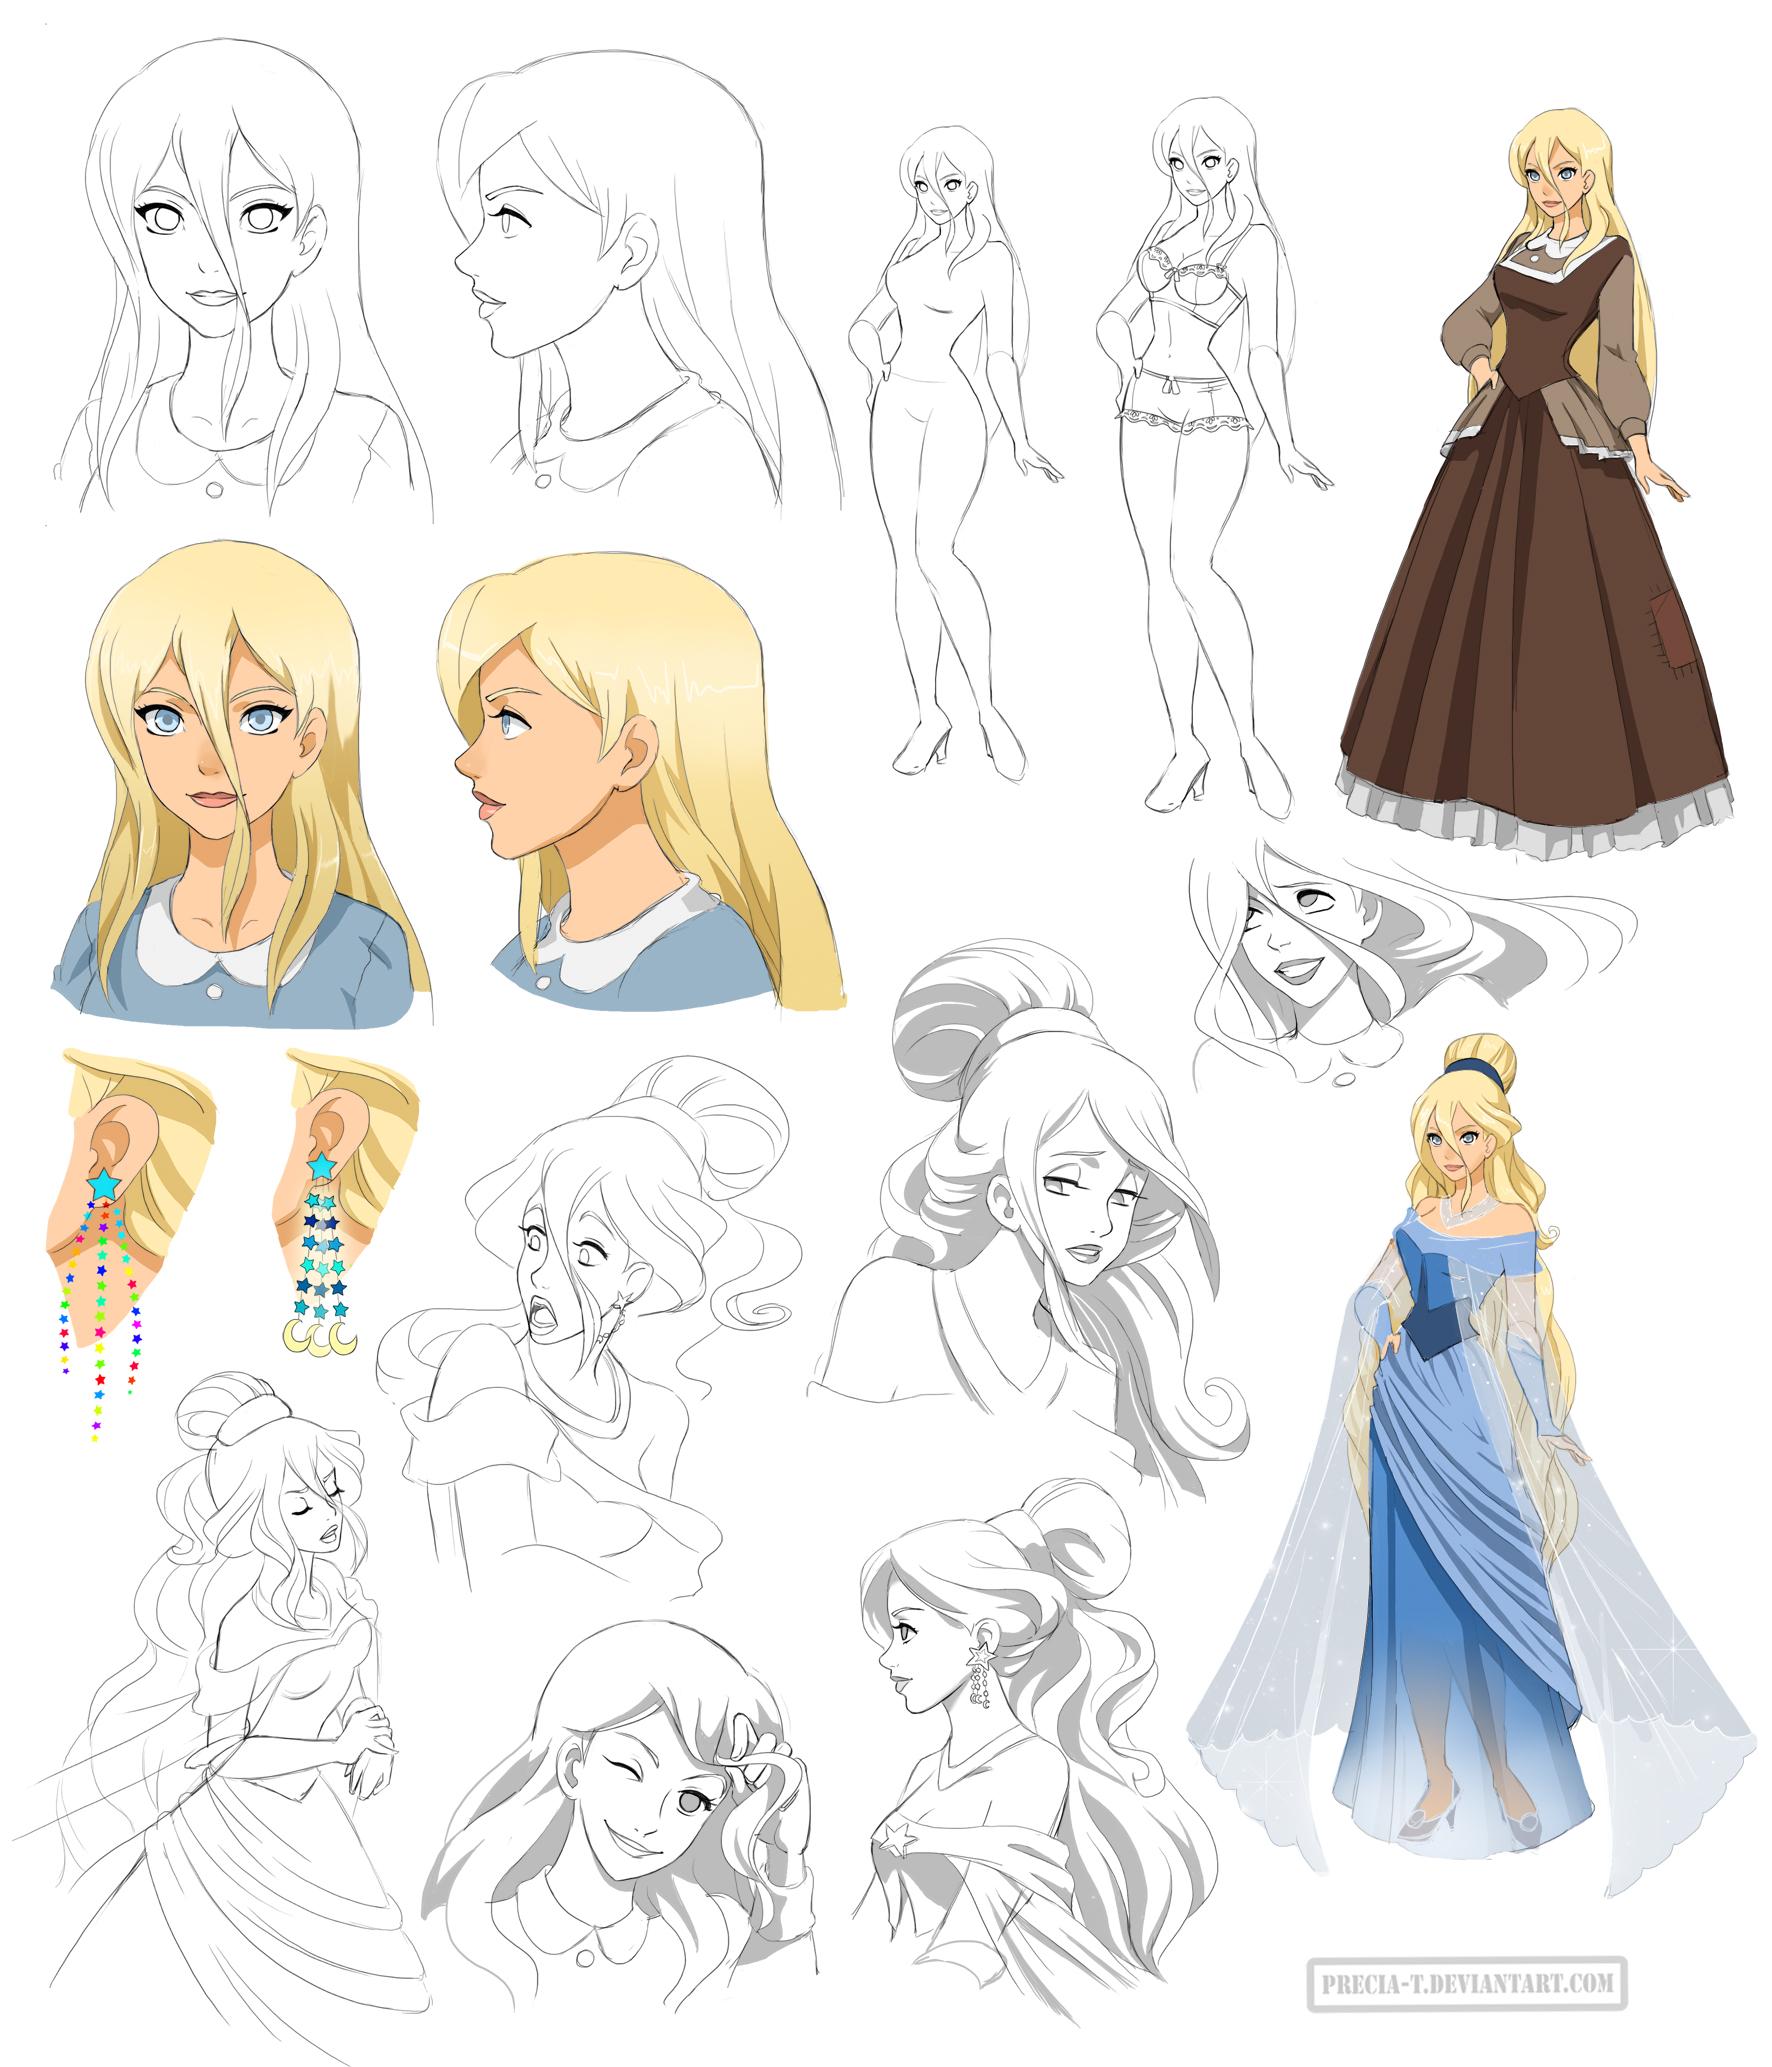 Deviantart Character Design Commission : Disney princess design starina commission by precia t